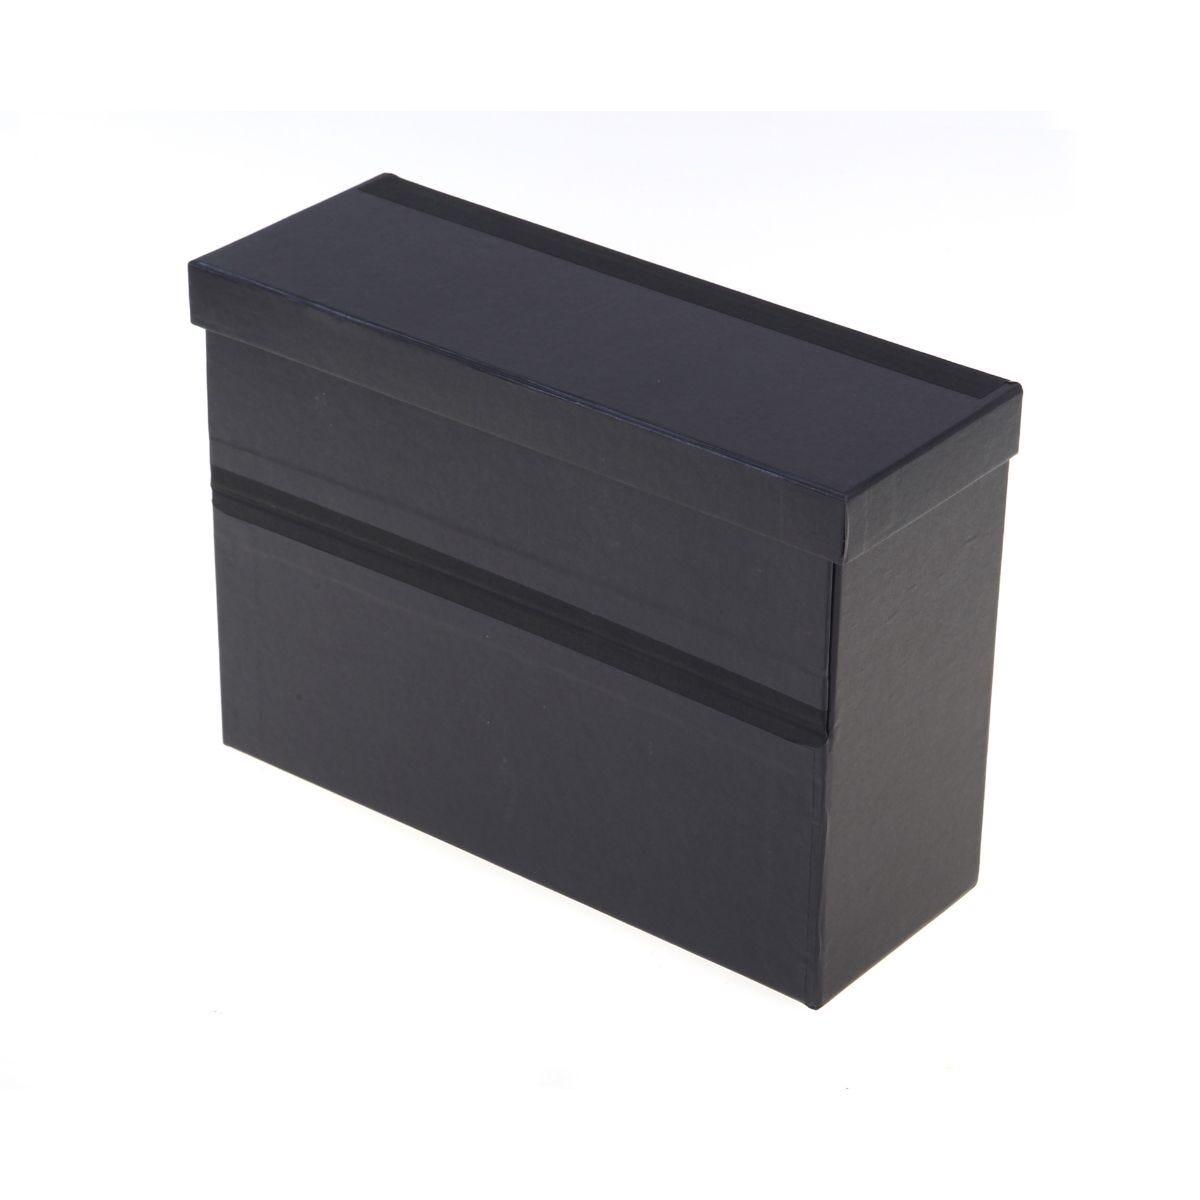 Office Supplies Ryman  Drop Side Filing Box Foolscap H260xW370xD135mm, Black